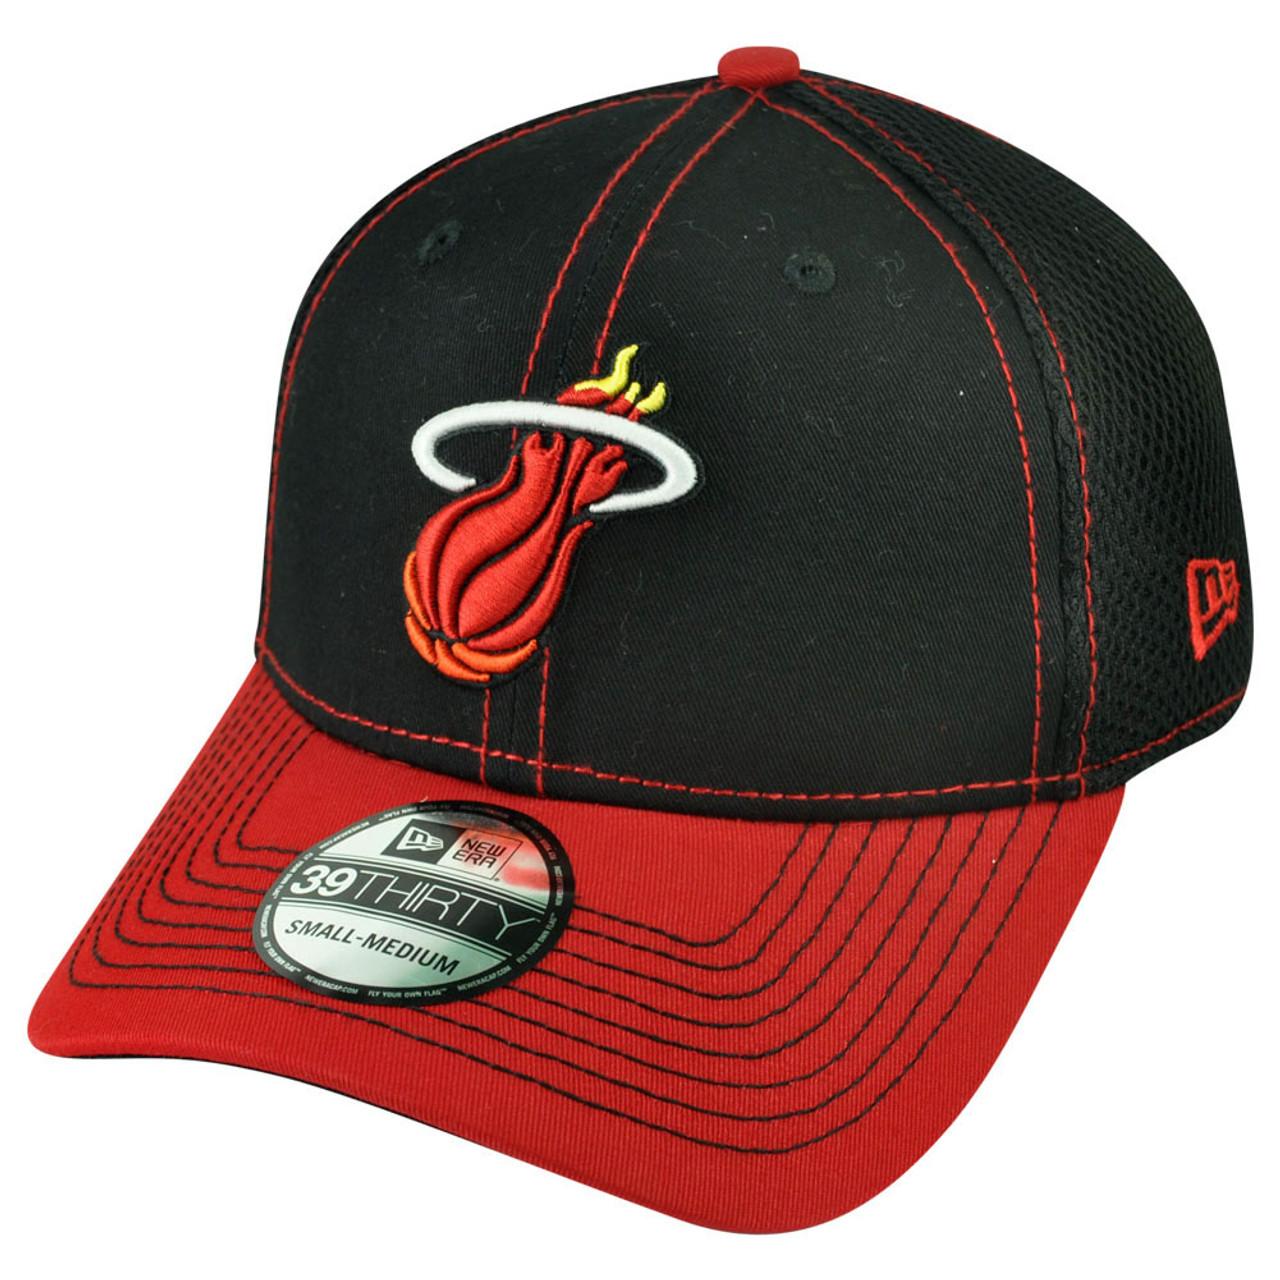 106a585a5dc NBA New Era 3930 Miami Heat Flex Fit Large XLarge 2Tone Neo Jersey Mesh Hat  Cap